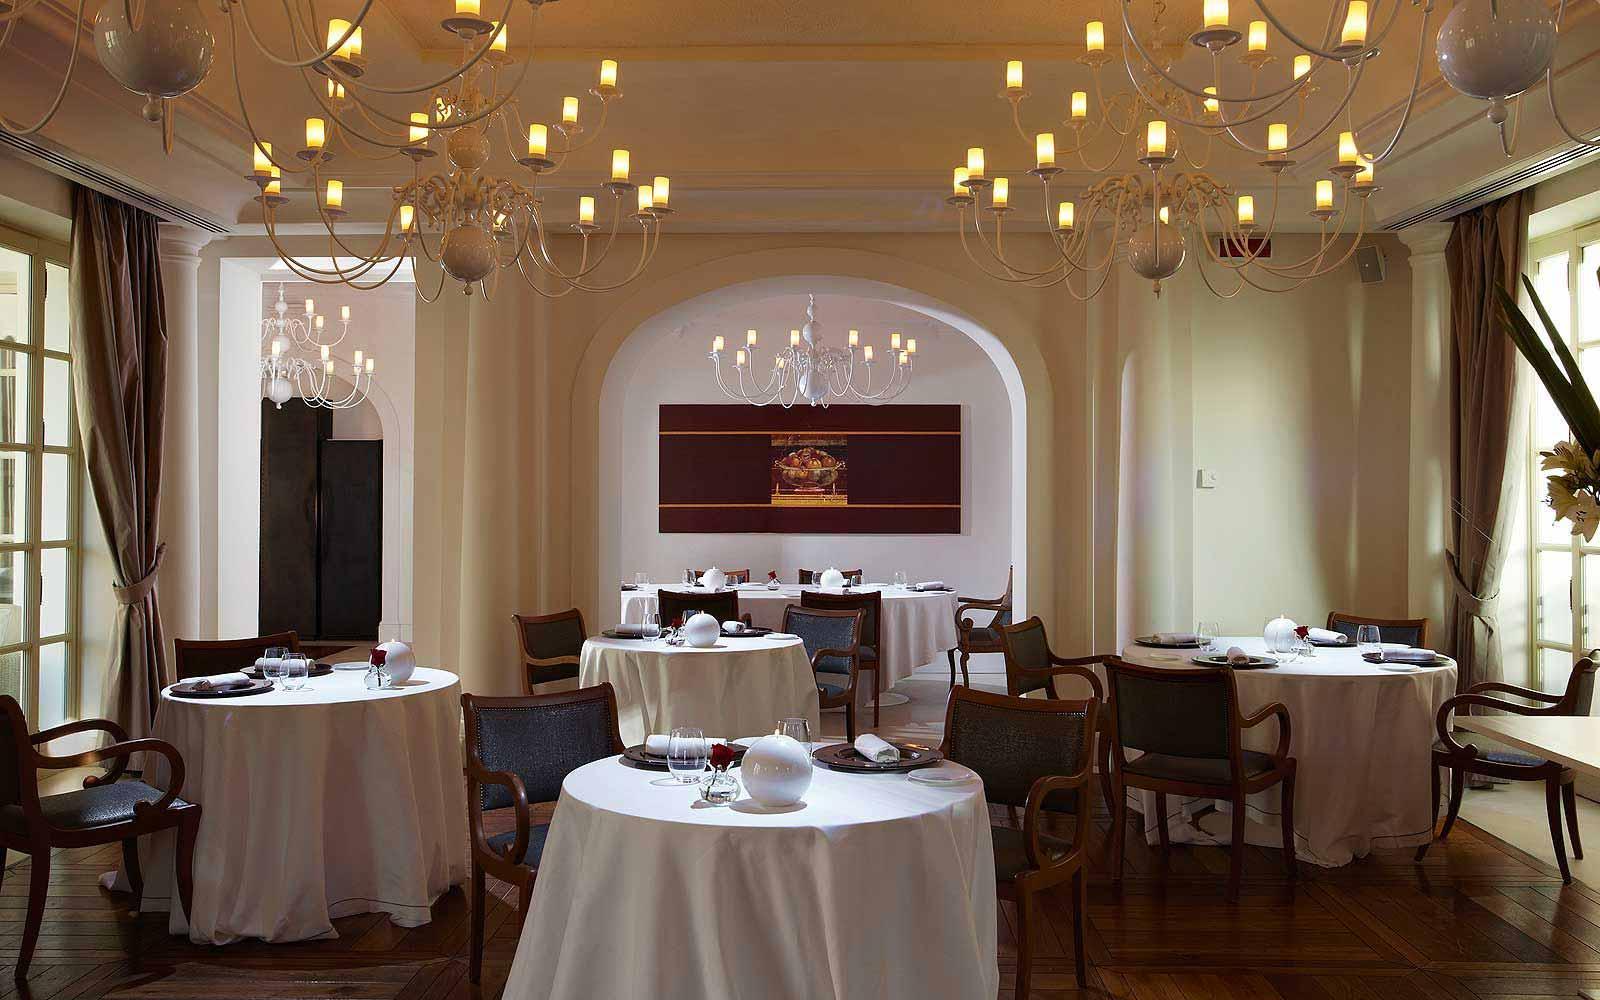 Viva Voce restaurant at Gran Melia' Rome